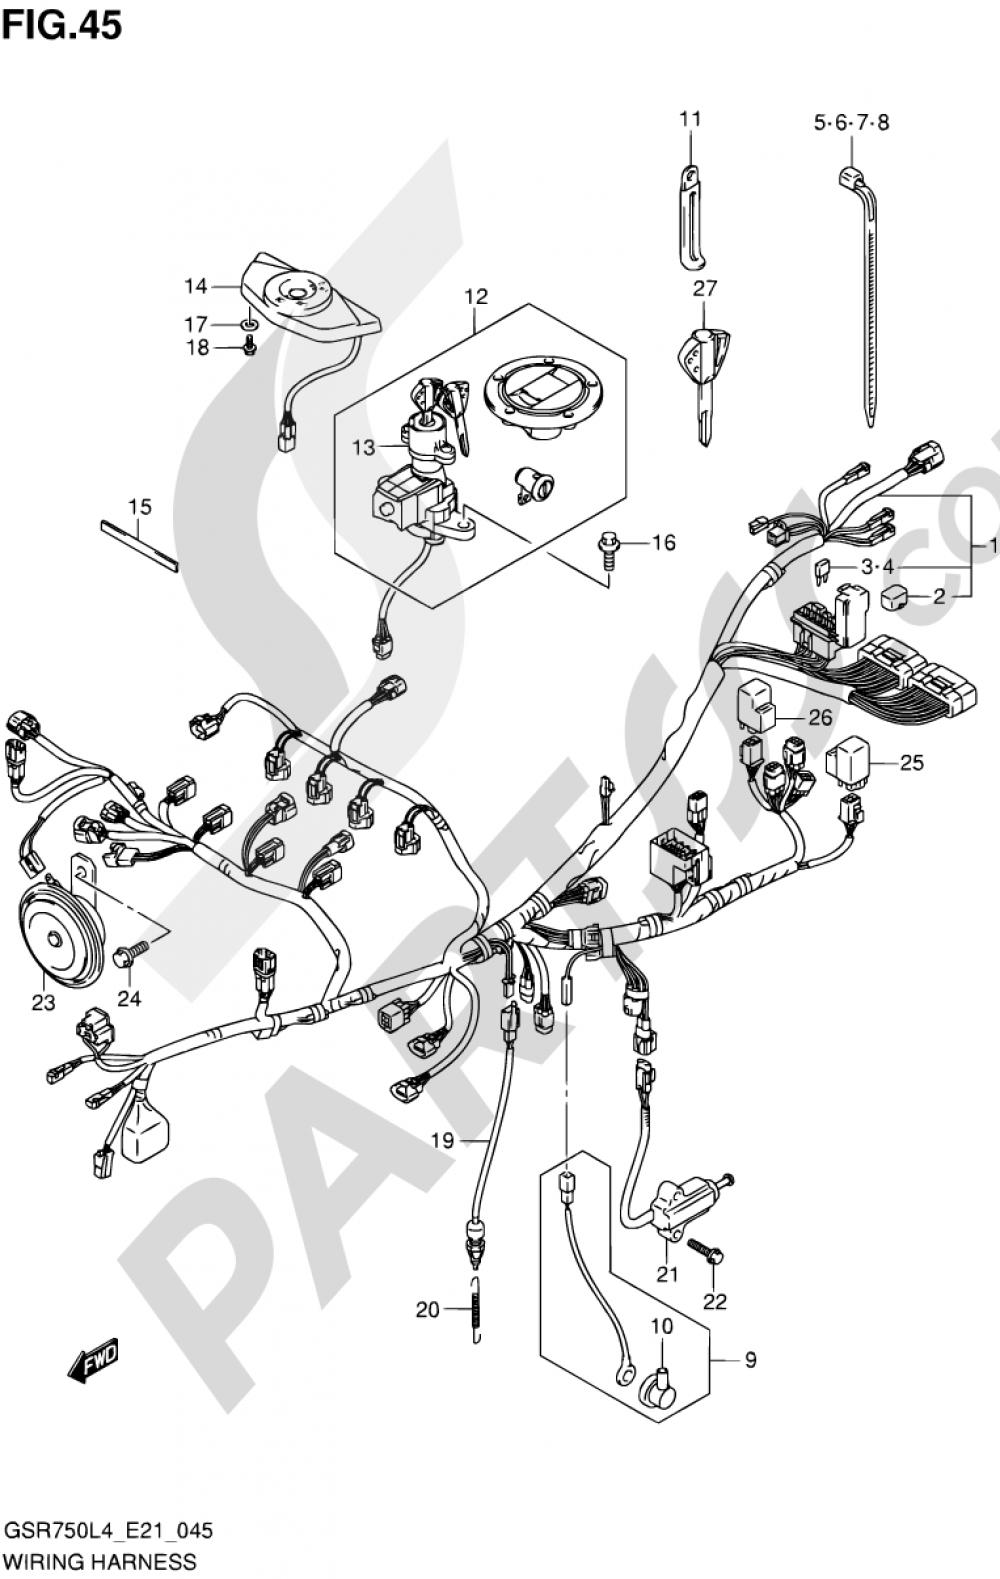 45 - WIRING HARNESS (GSR750L4 E21) Suzuki GSR750A 2014